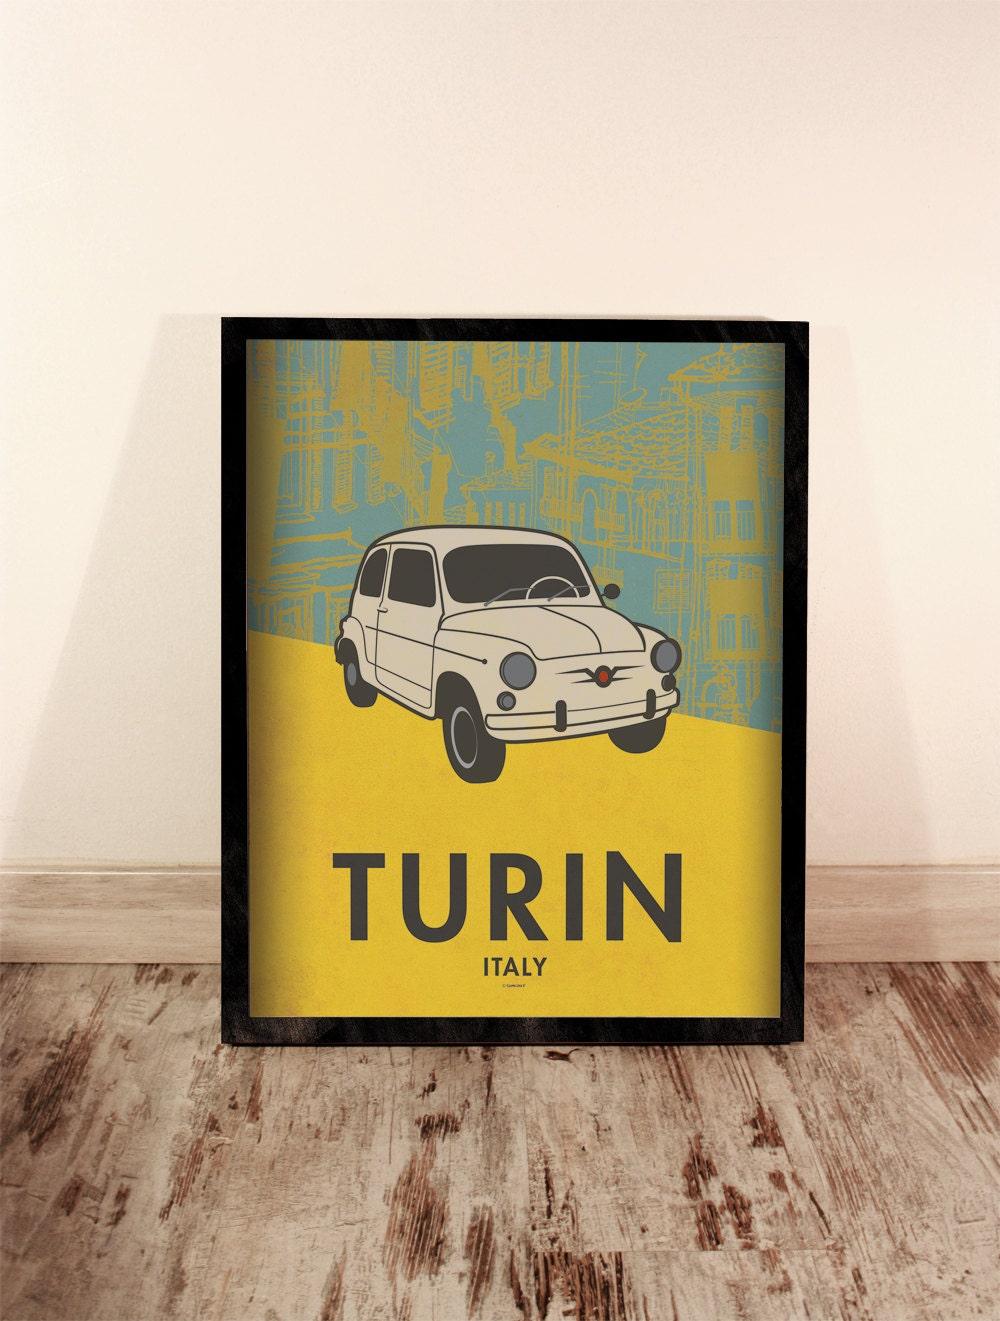 Turin Print Italy Cityscape Car Poster Home Decor Wall Decor Art Typography Art Digital Print City Travel 15 75x19 69 Inch